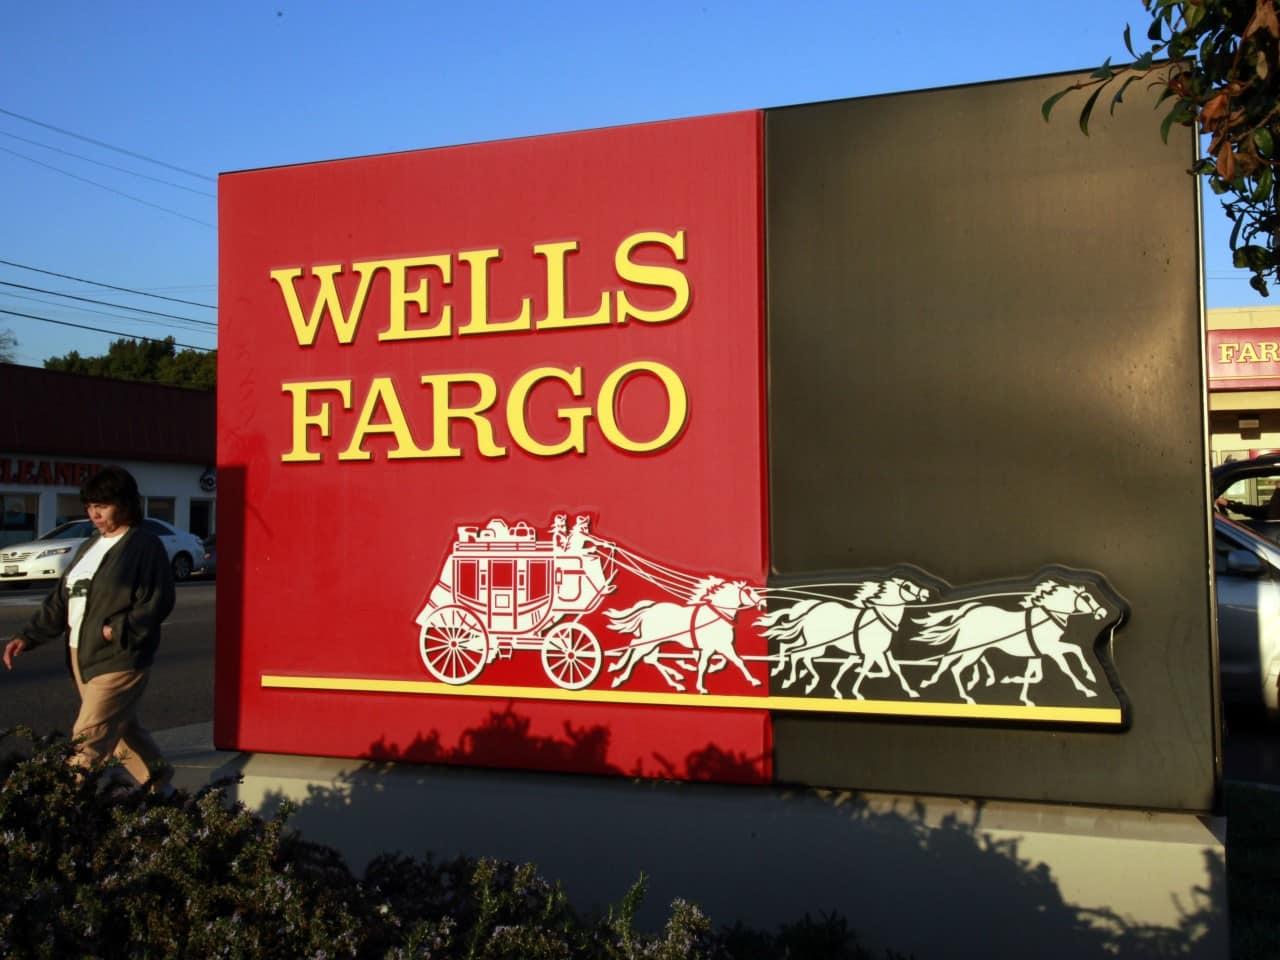 earns-wells-fargo أزمة ثالث أكبر بنك في أمريكا Wells Fargo وخطر الإفلاس